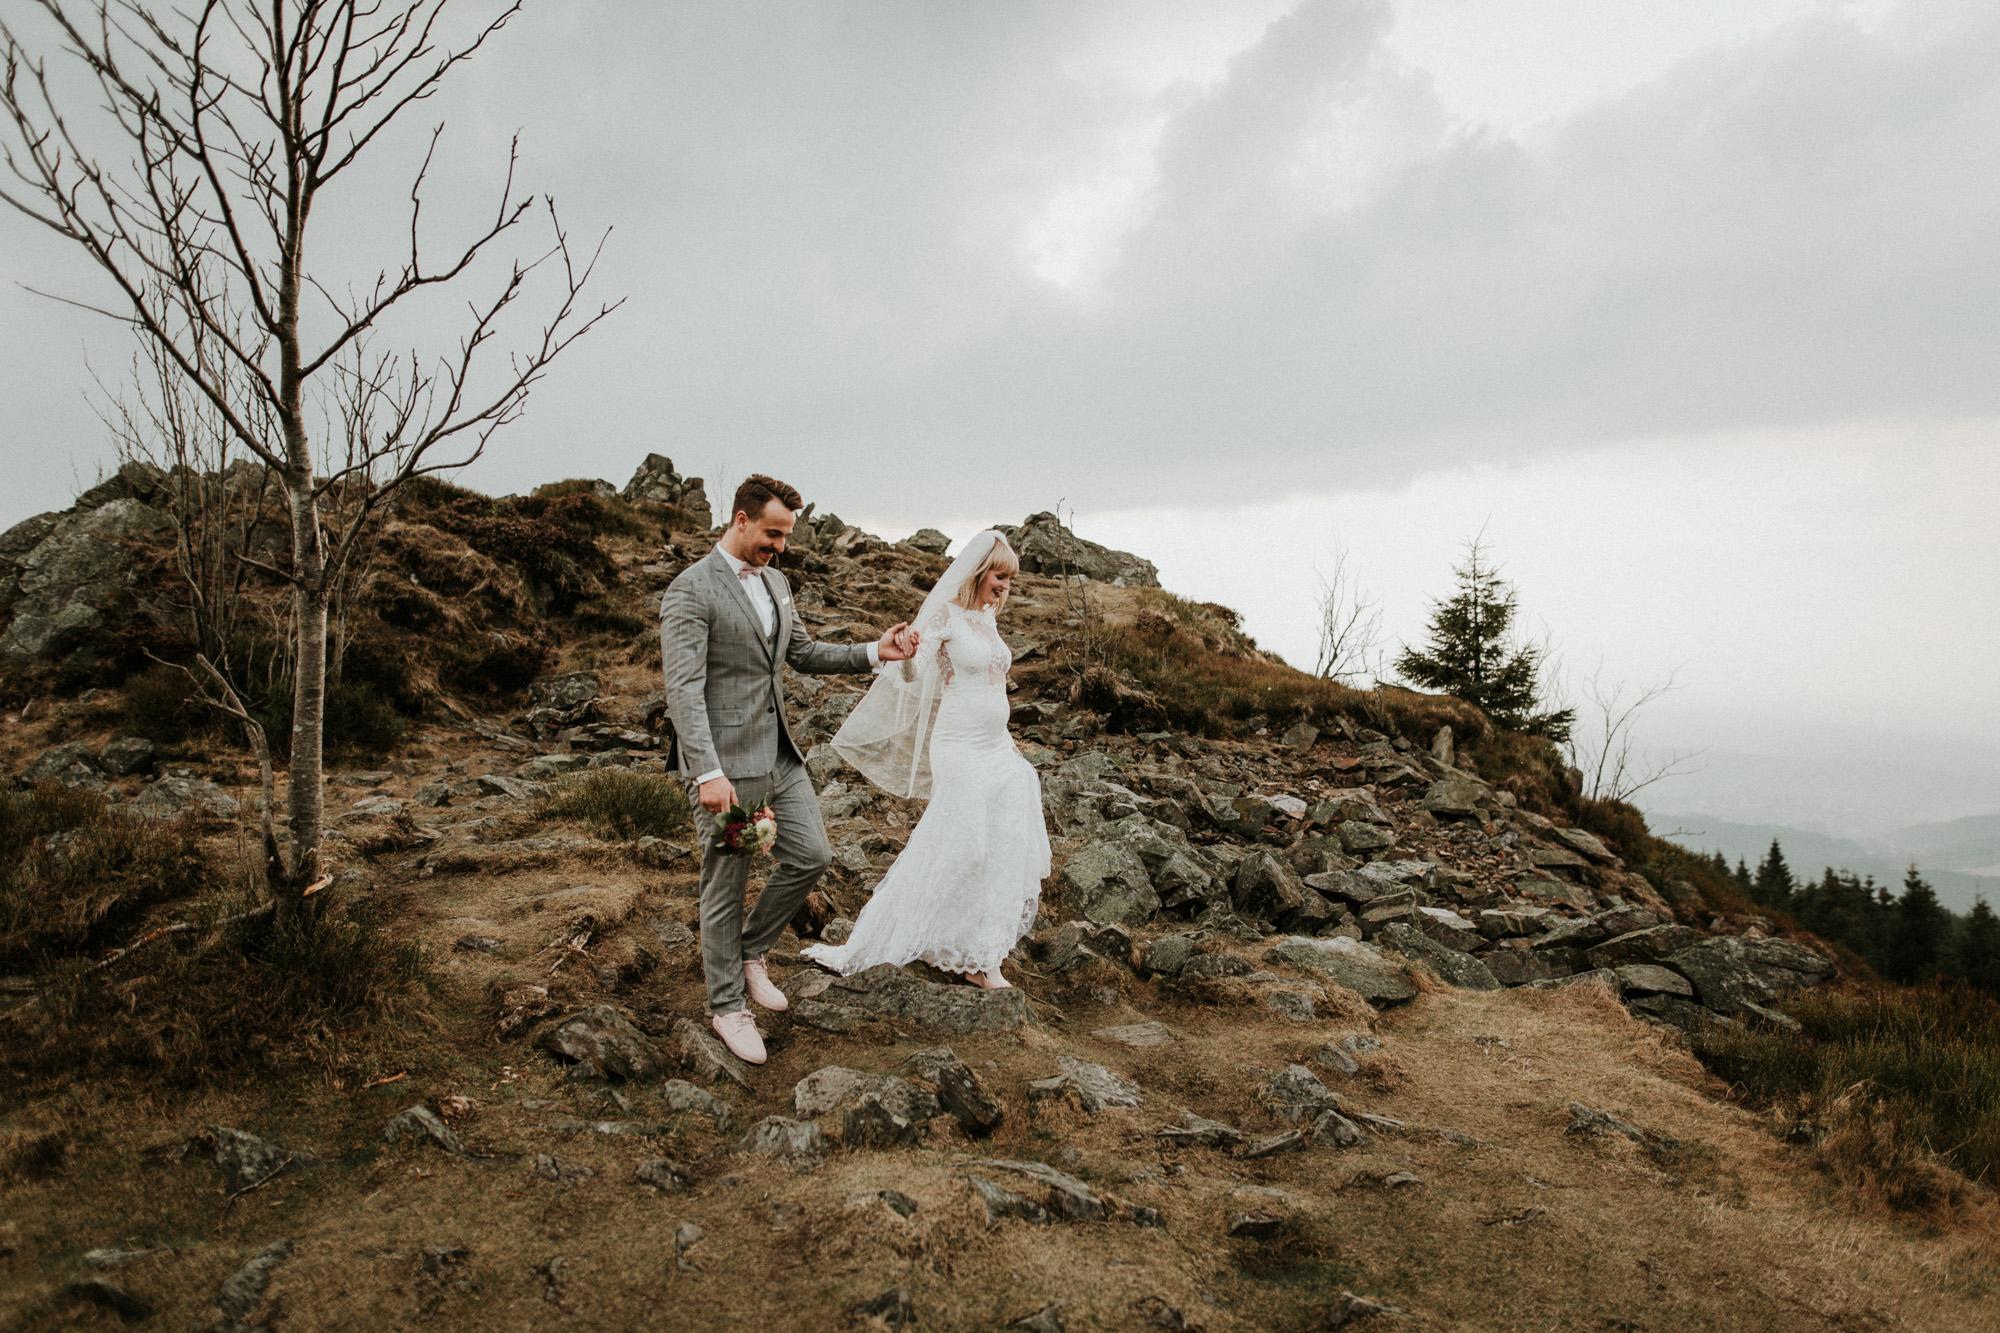 DanielaMarquardtPhotography_Hochzeitsfotograf_Düsseldorf_Köln_Mallorca_Bayern_Austria_Harz_LinaundMaik_Afterwedding-Shooting_Weddingphotographer_Ibiza_Tuskany_Italien_Toskana59